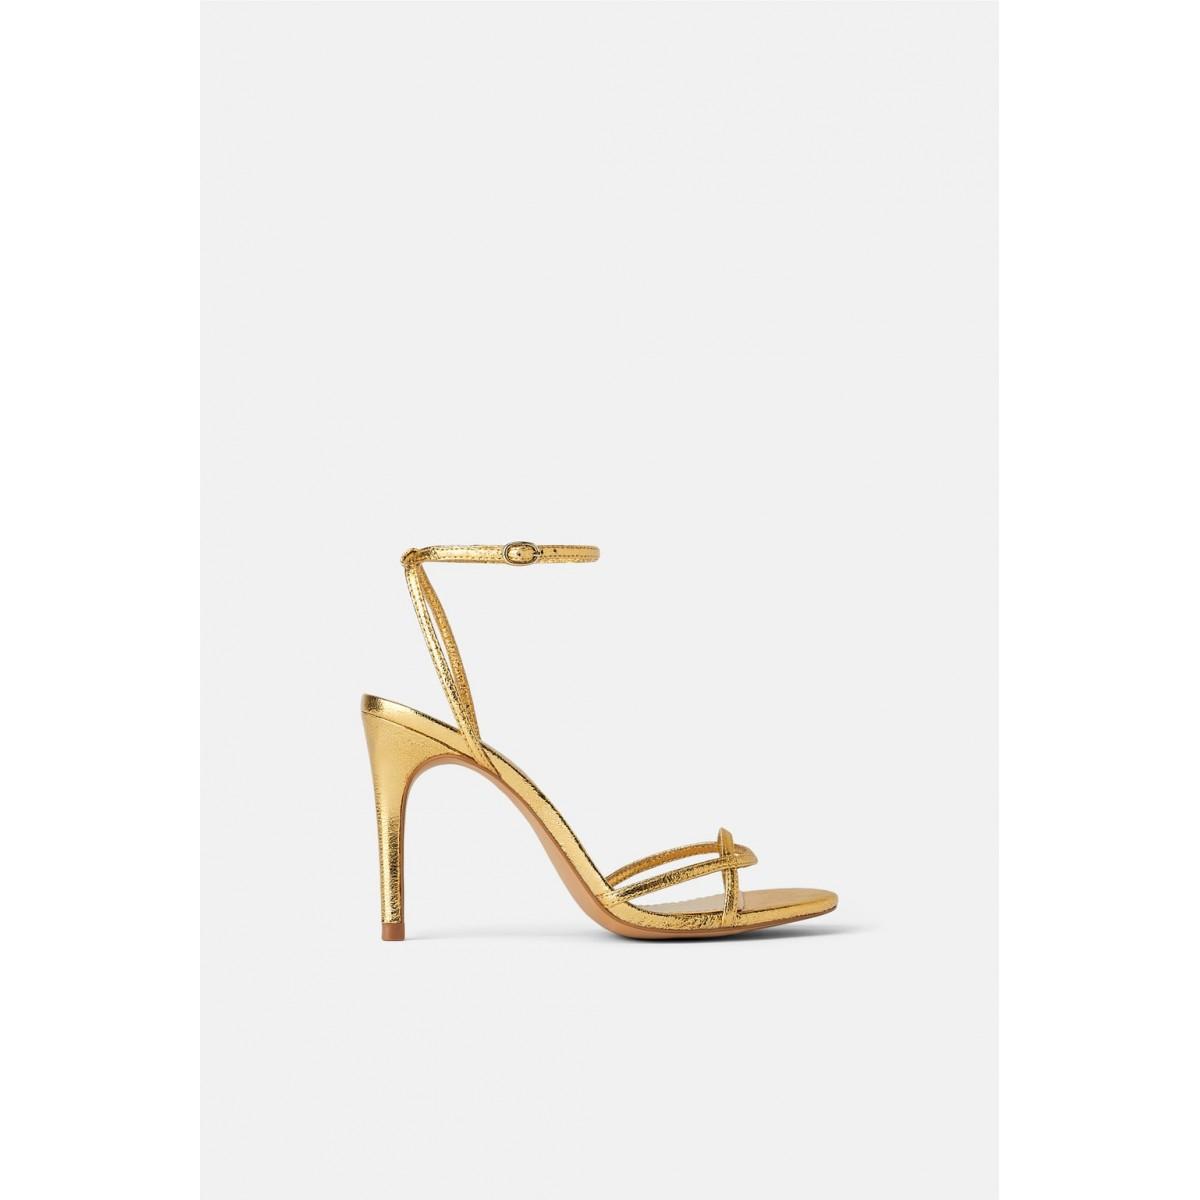 Zara Heeled Sandals With Thin Straps